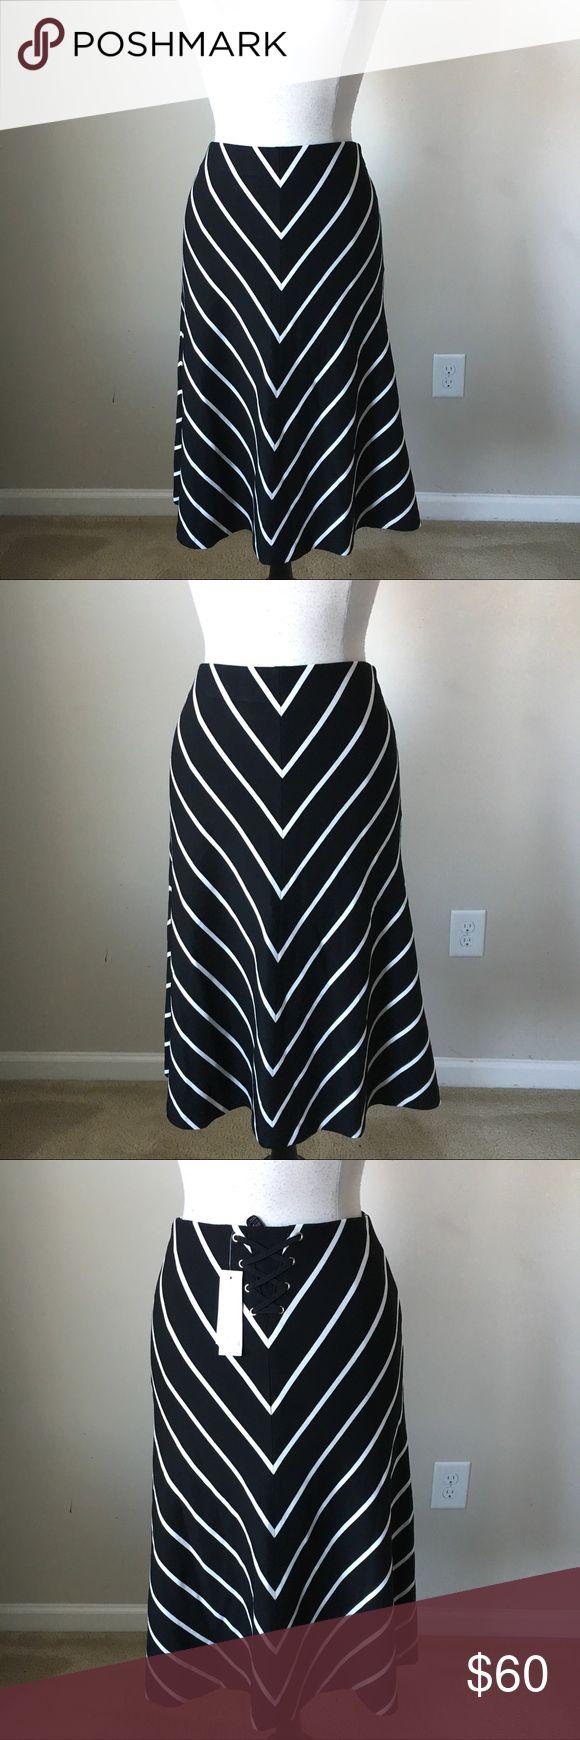 Chevron striped A-line ponte midi skirt -Fully lined -Shell: 68% Rayon, 27% Nylon, 5% Spandex White House Black Market Skirts A-Line or Full